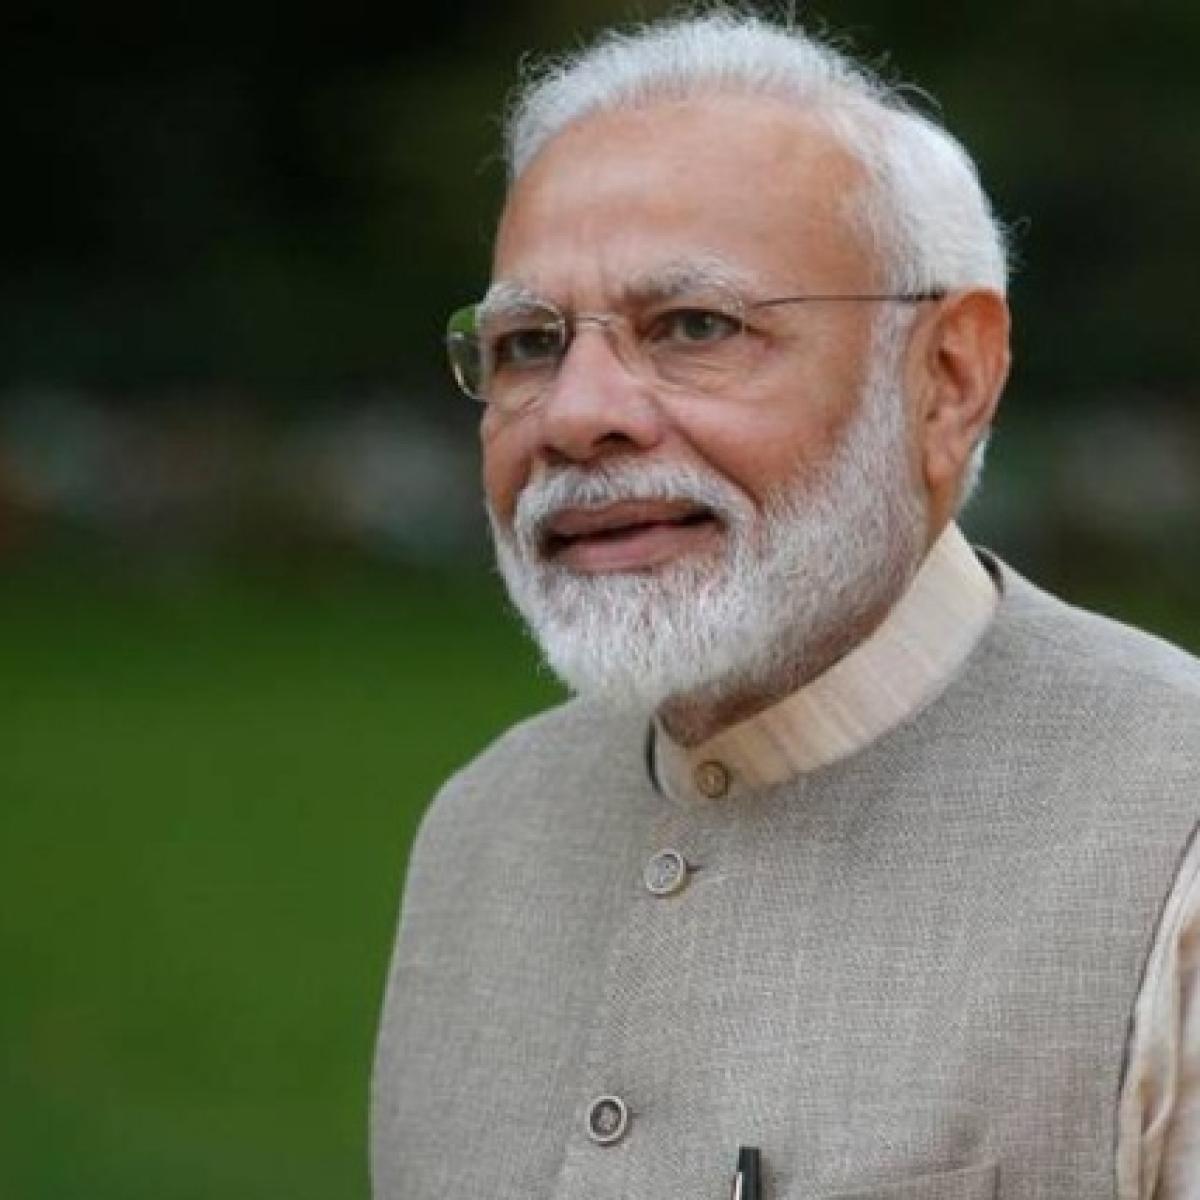 PM Narendra Modi to attend ASEAN summit in Bangkok today